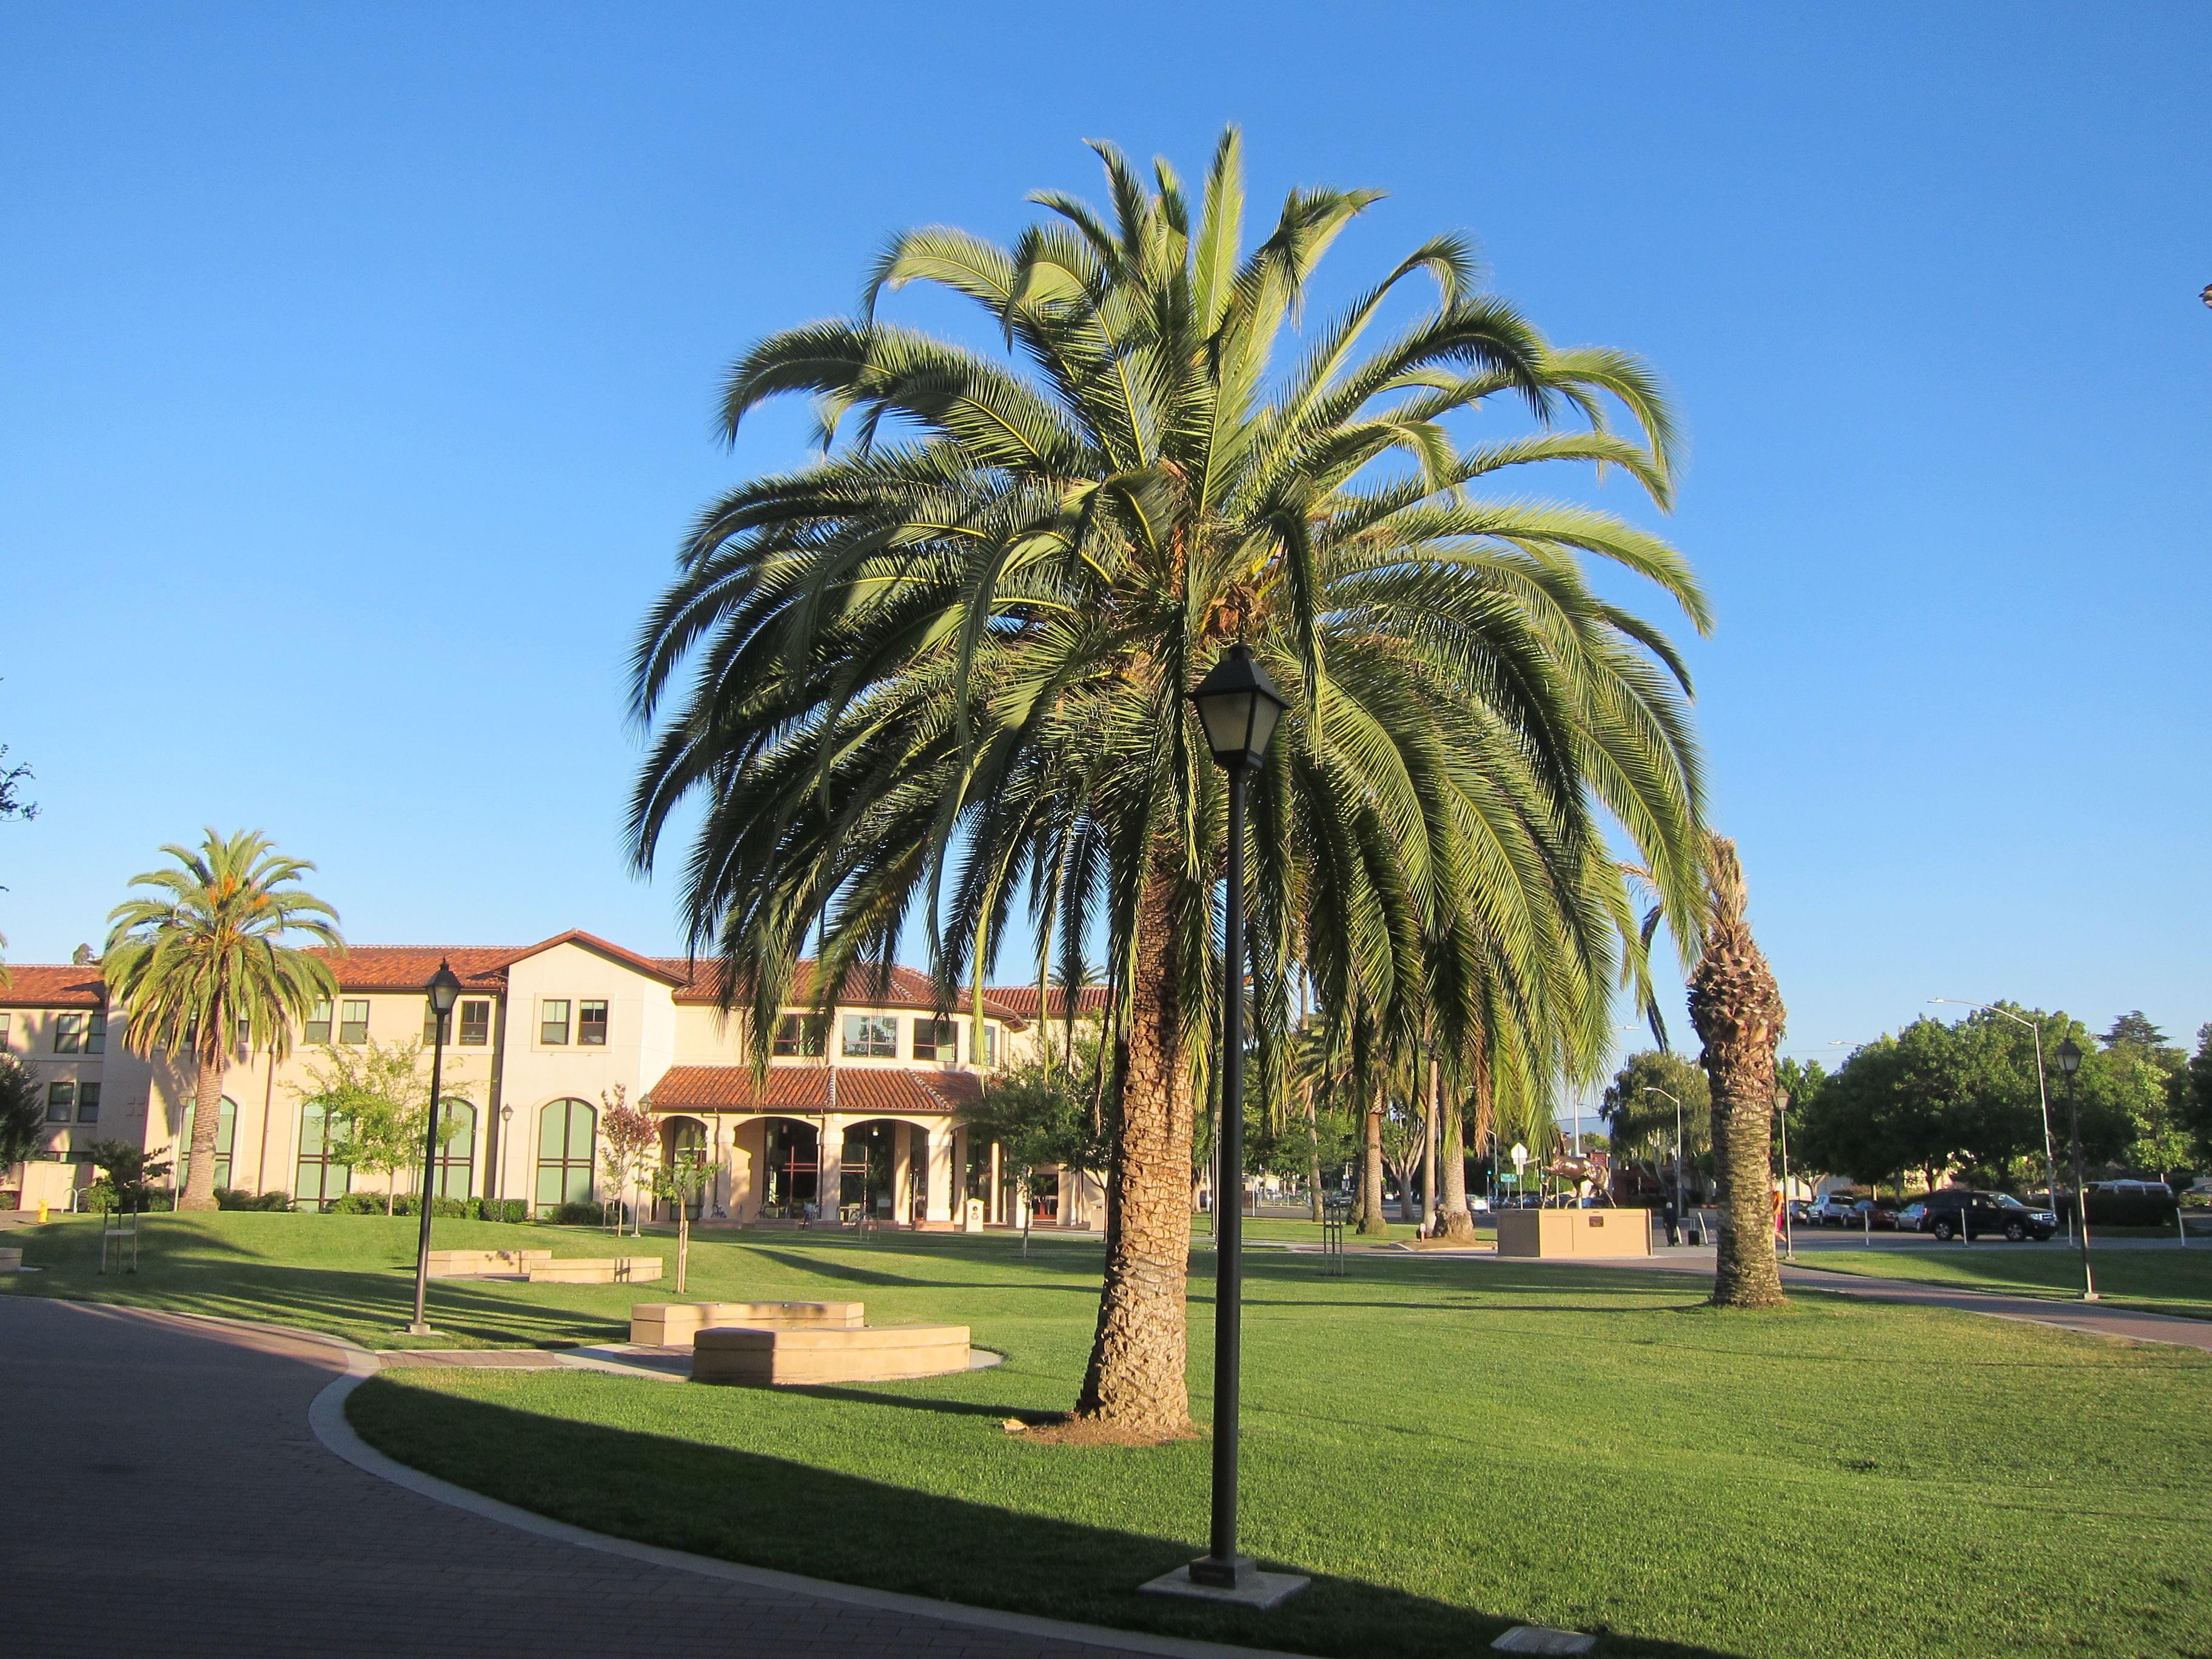 tenth triennial conference recap conference on the santa clara university